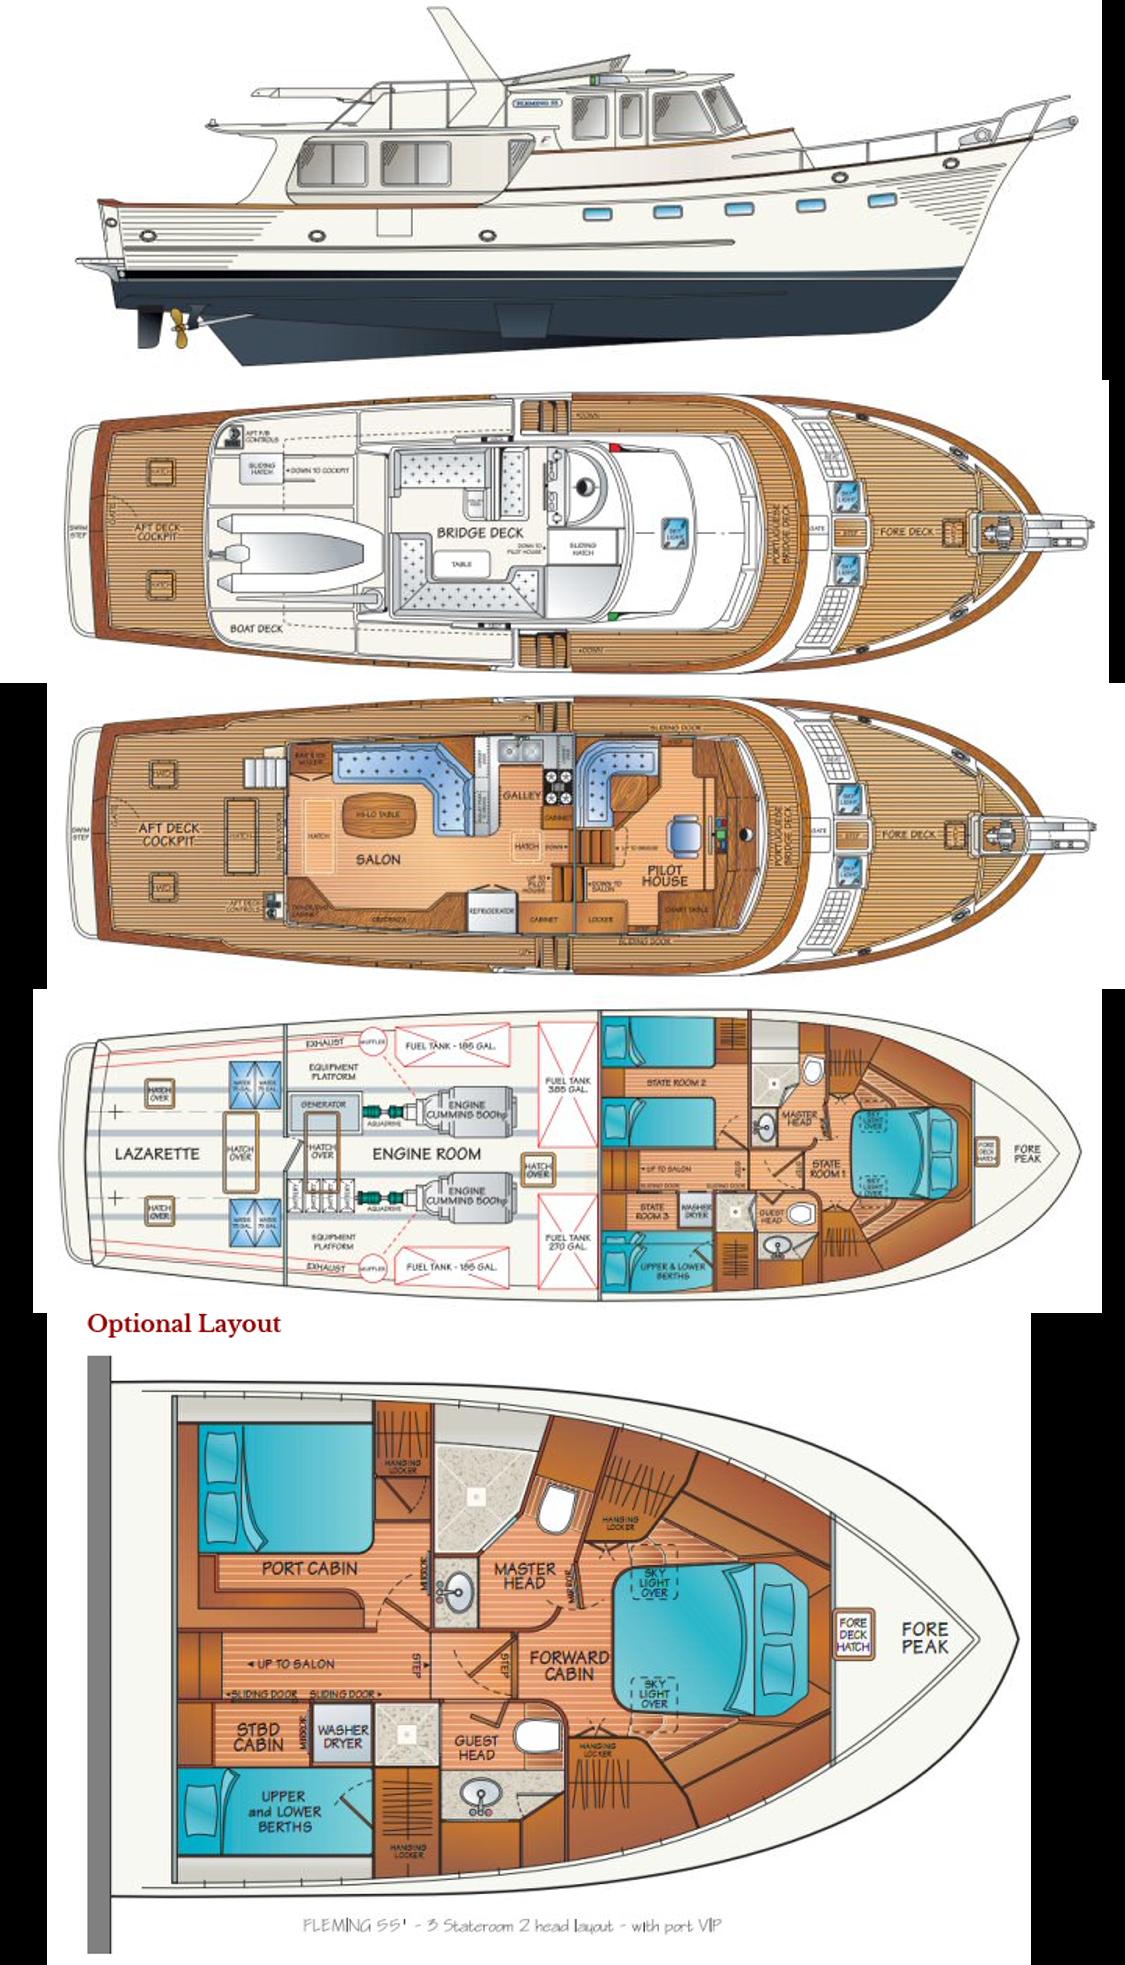 Engine Room Layout: Layout - Flemming 55